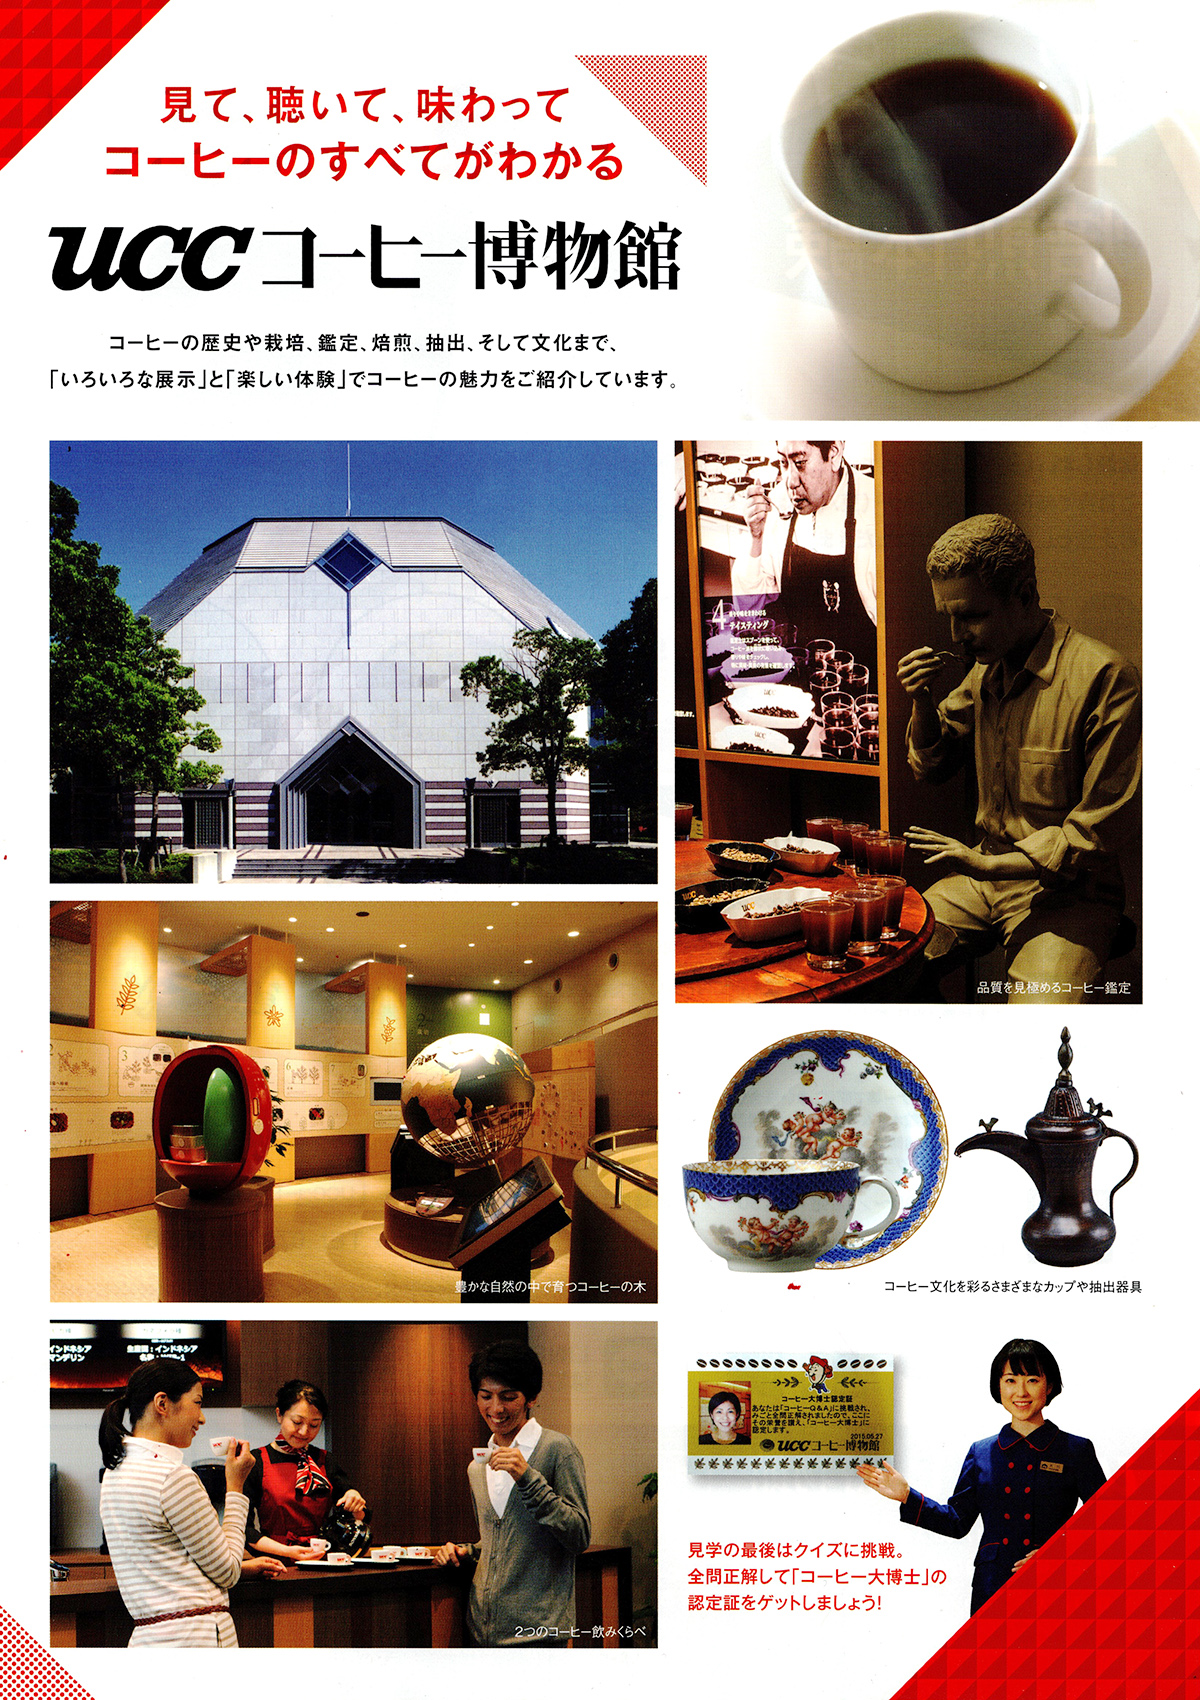 190827_ucc_coffee_01.jpg